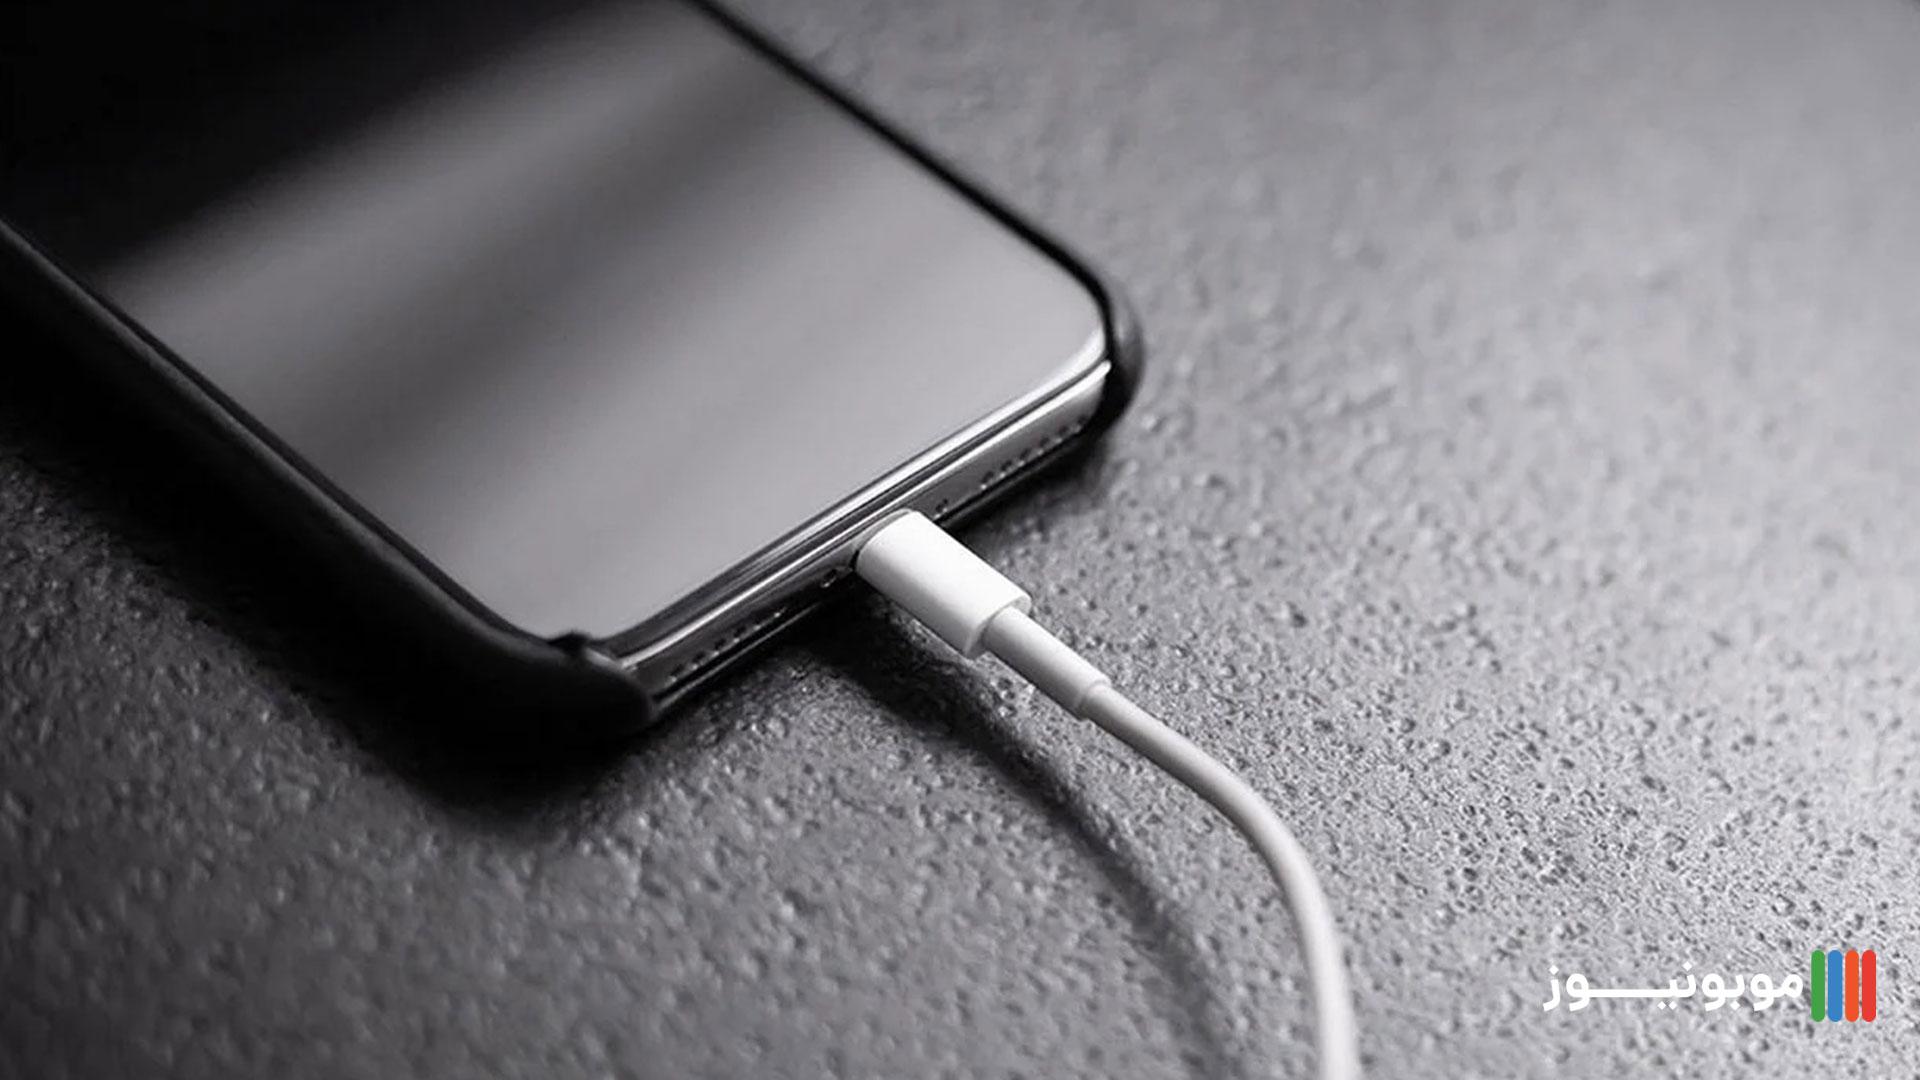 شارژ کردن گوشی بدون قاب